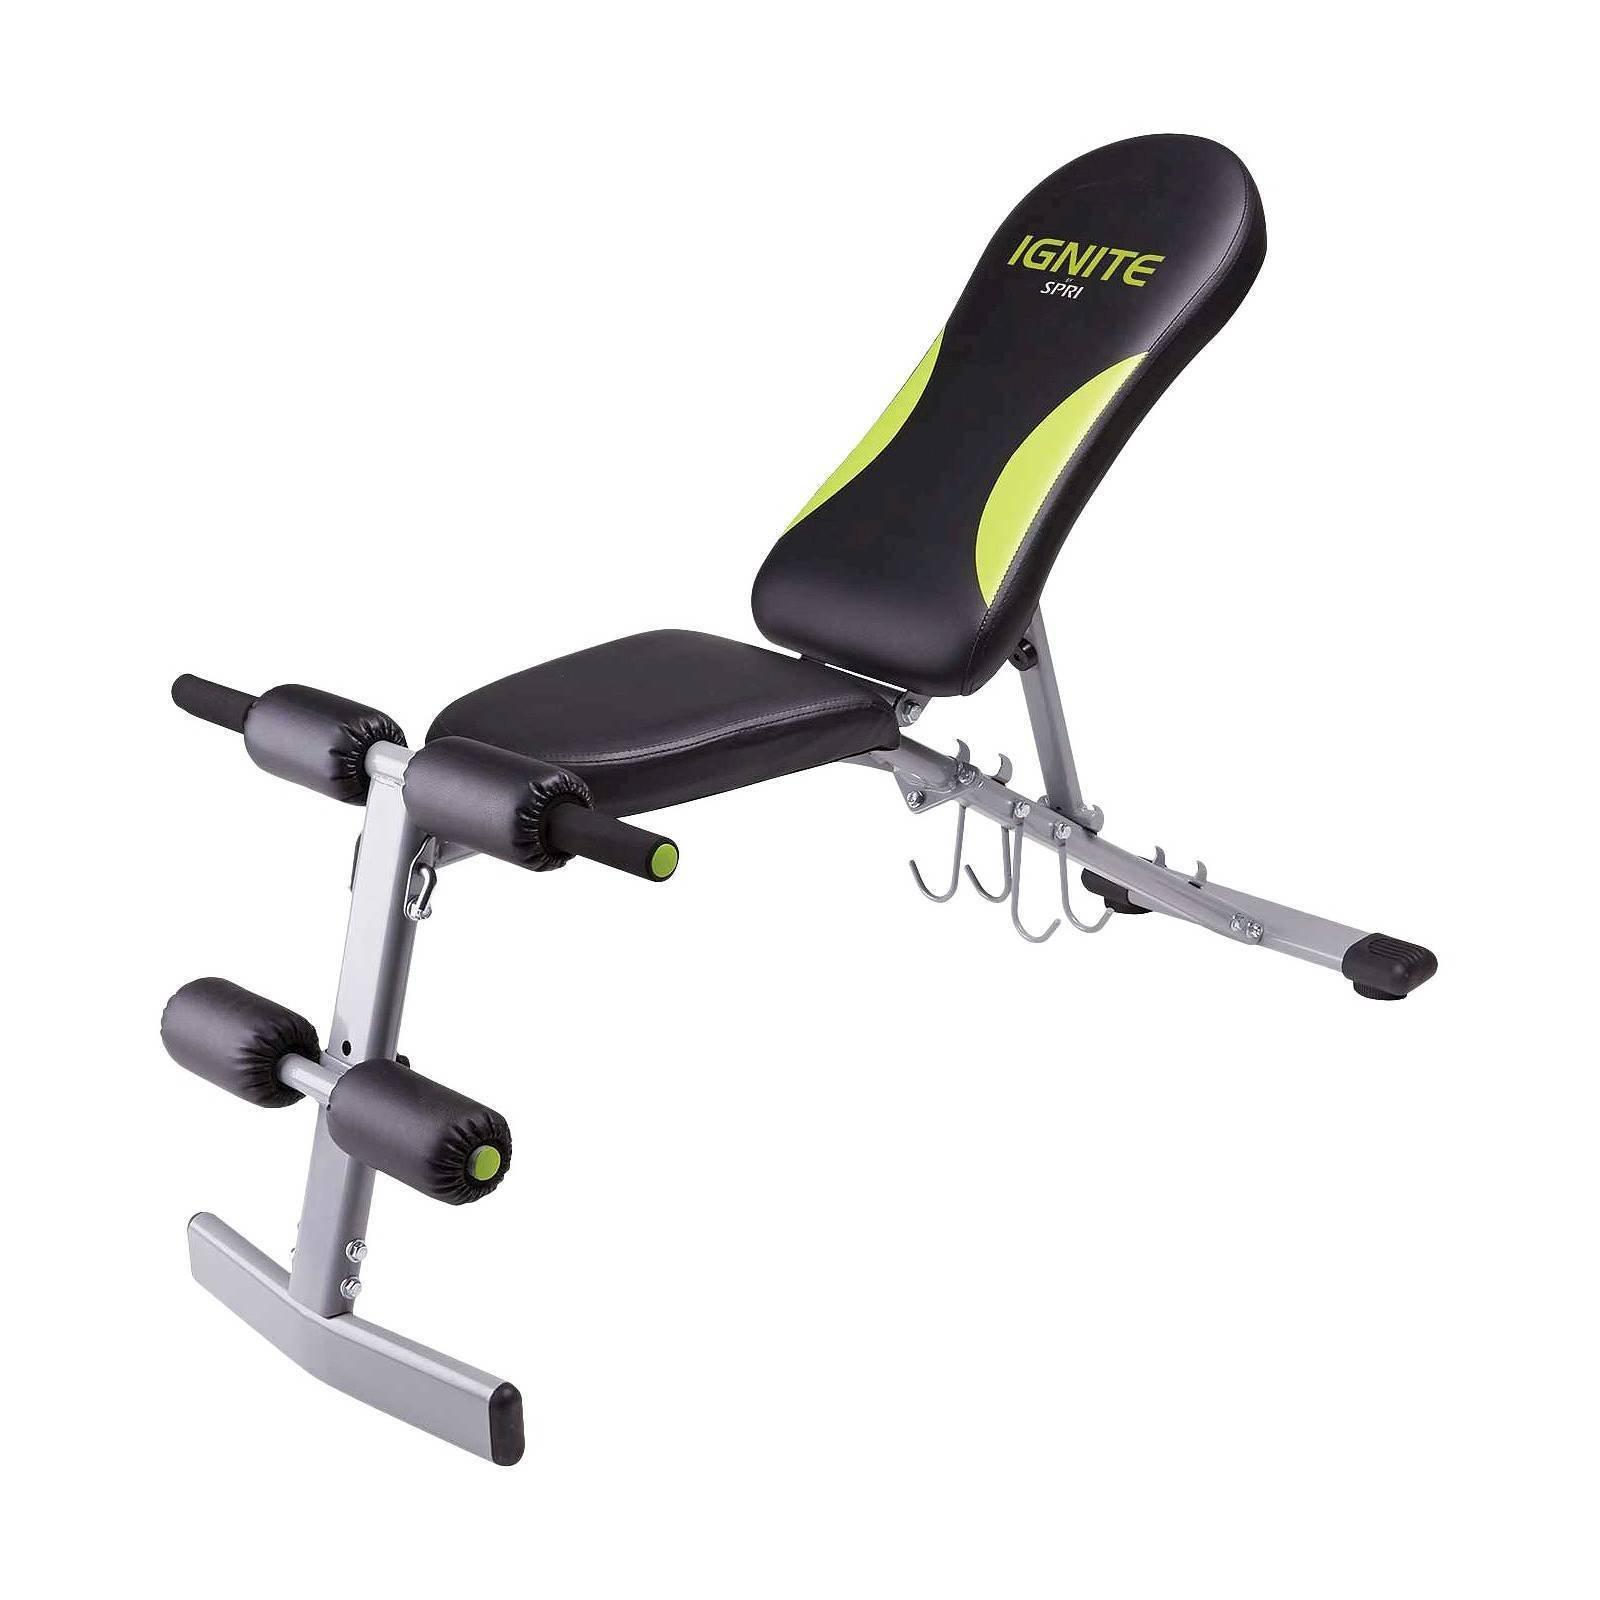 Ignite Fitness Bench